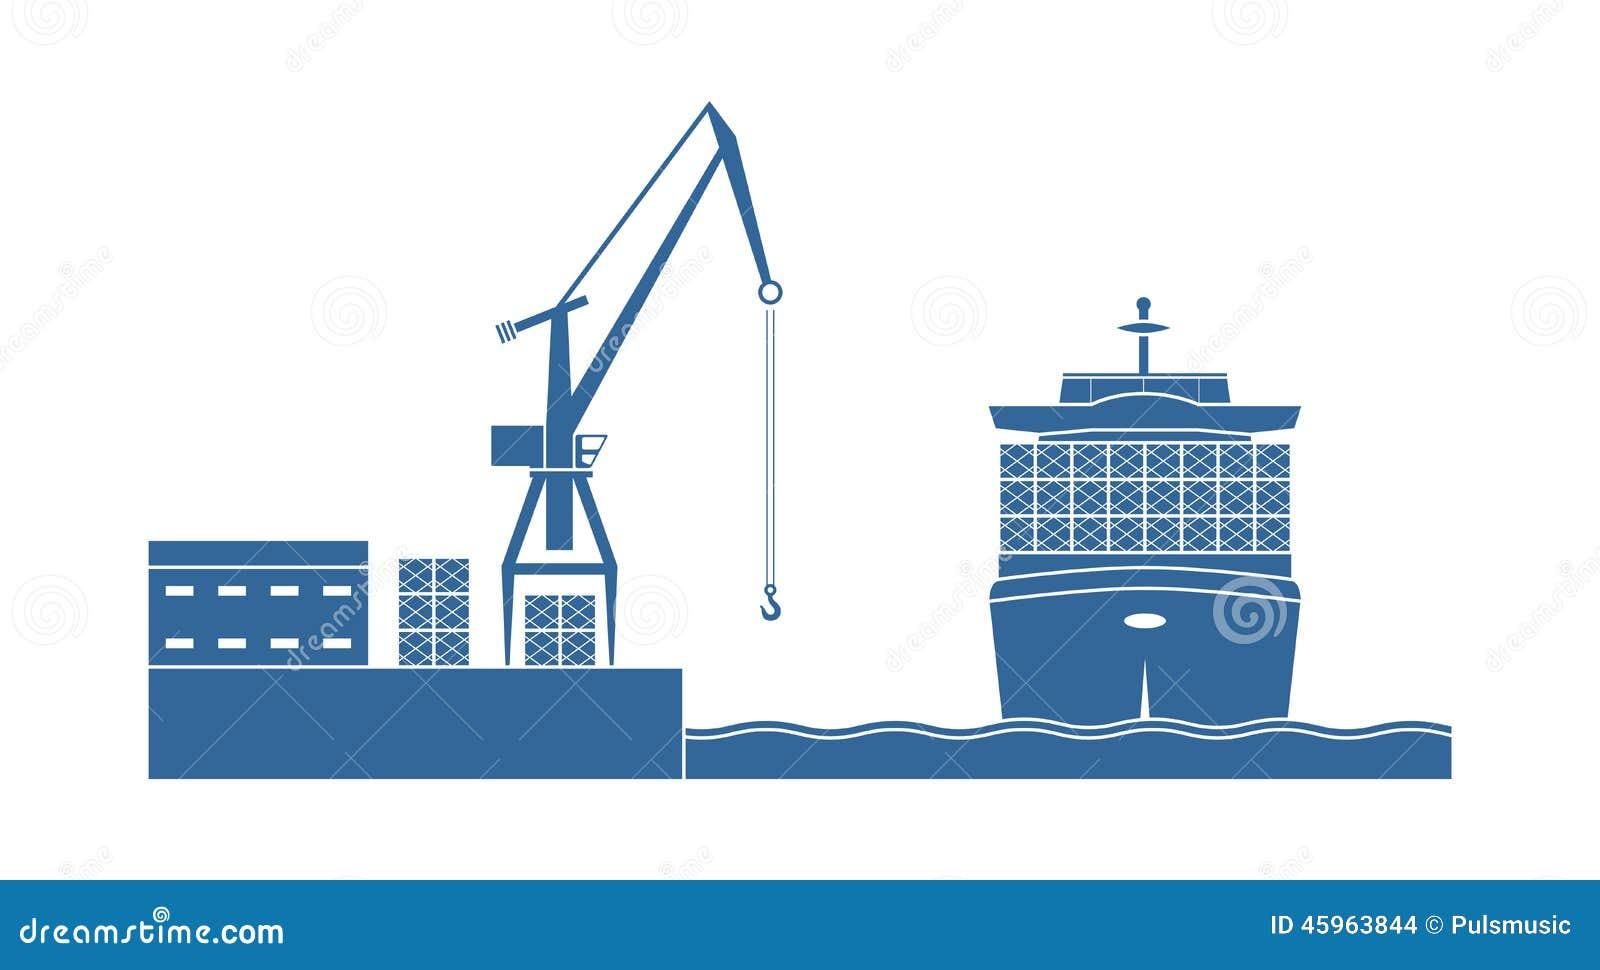 Graphic Design Ship In Ocean